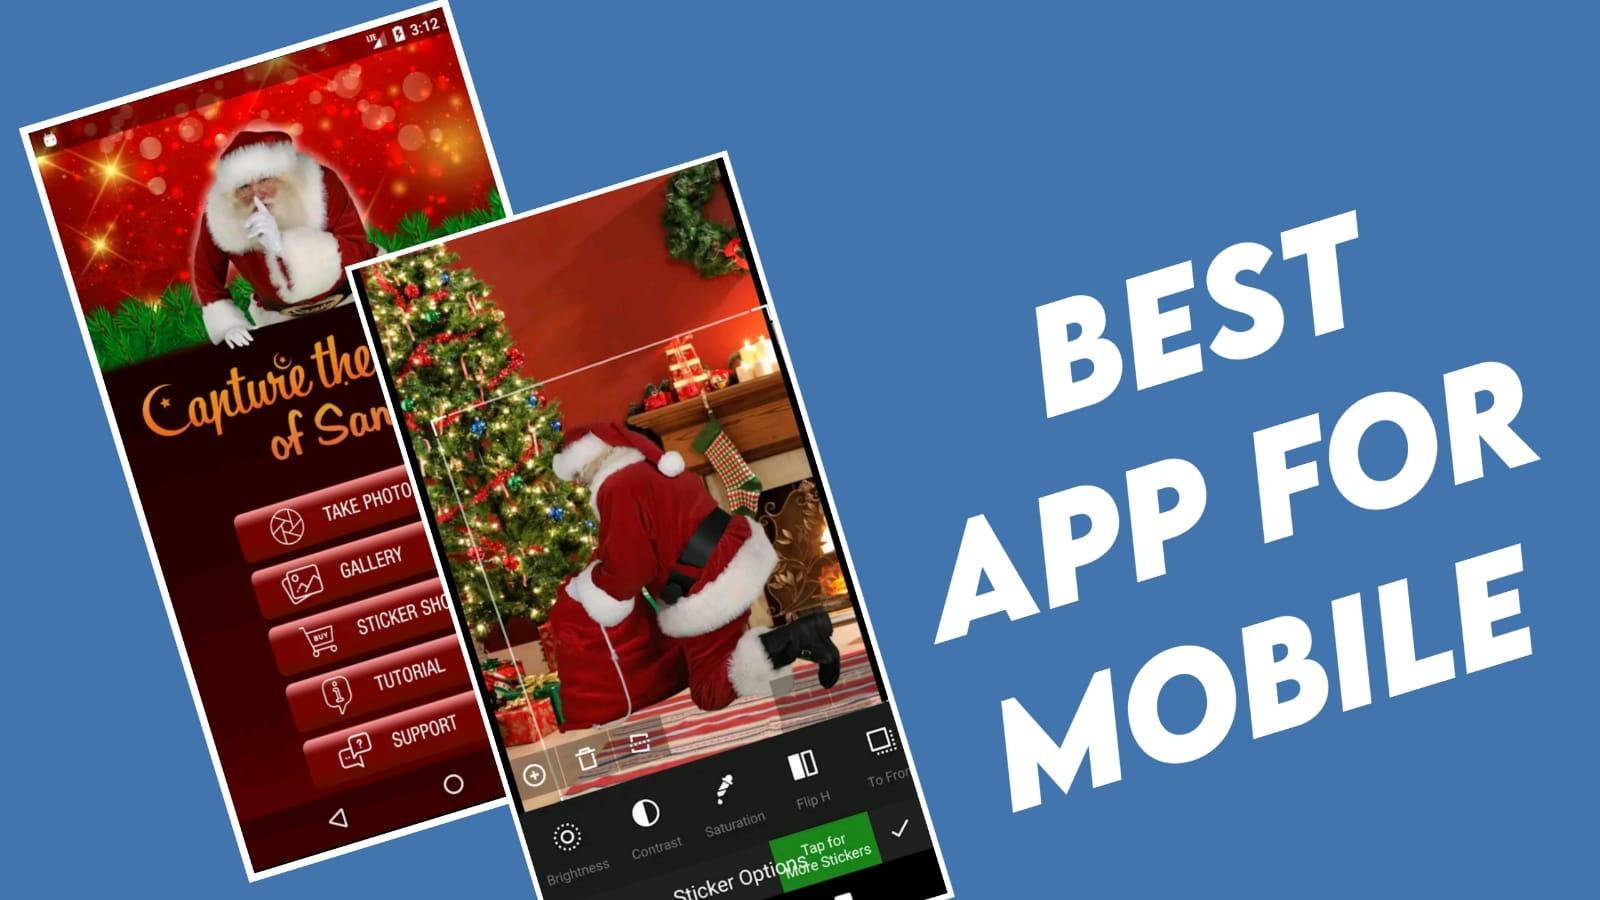 Catch Santa App Free Download